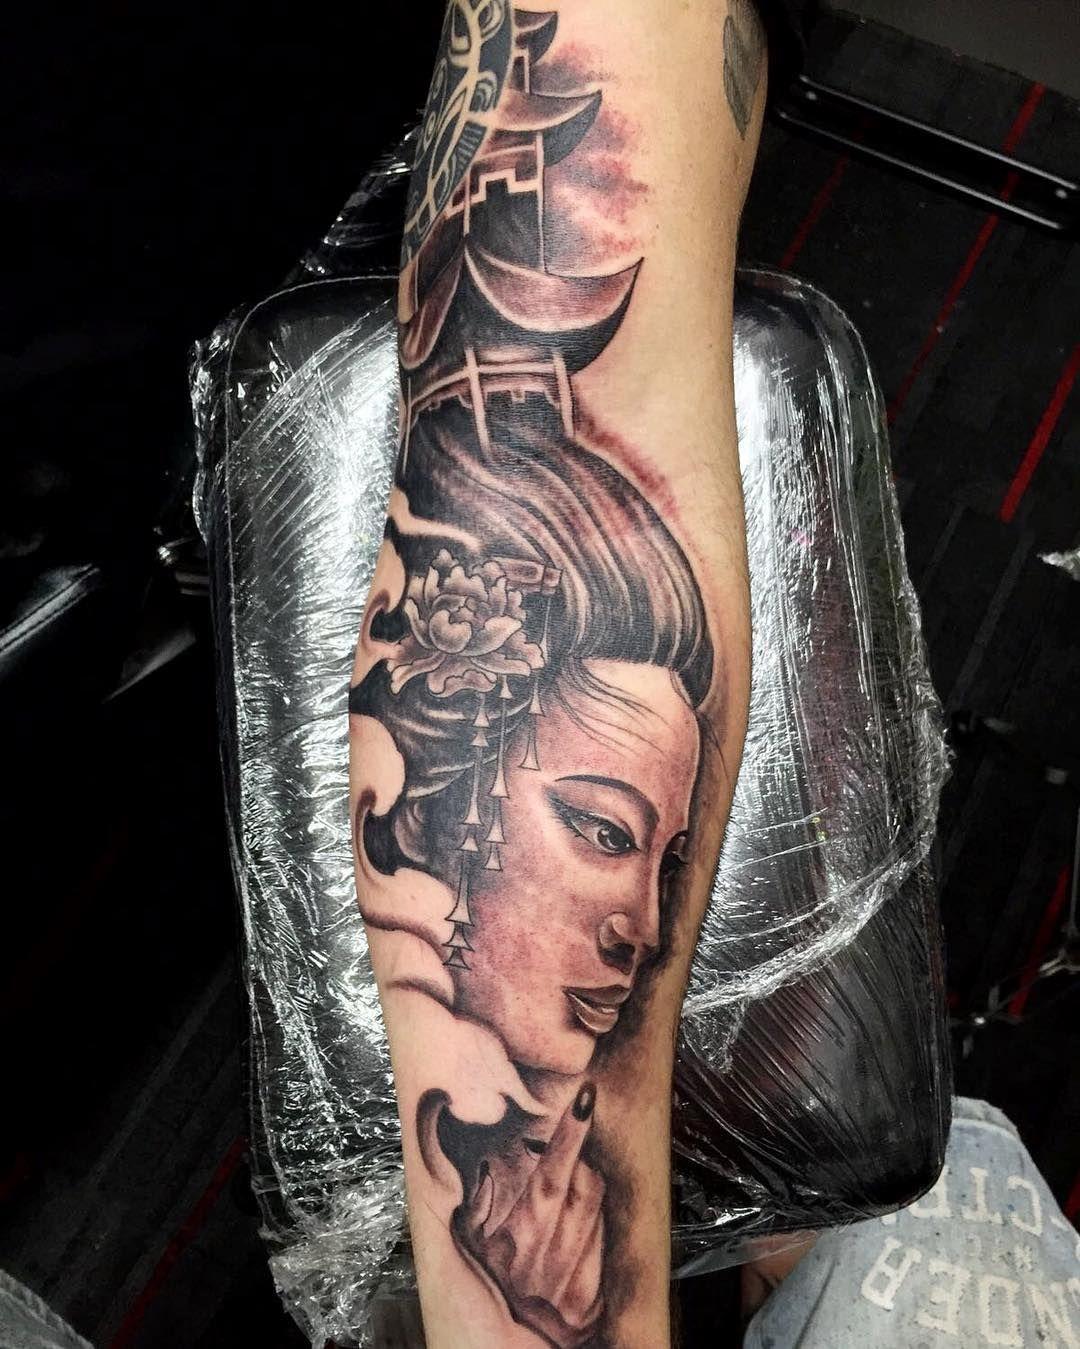 Geisha tattoo elegant geisha tattoo picture - Cool 55 Striking Geisha Tattoo Designs An Intelligent And Elegant Lady Check More At Http